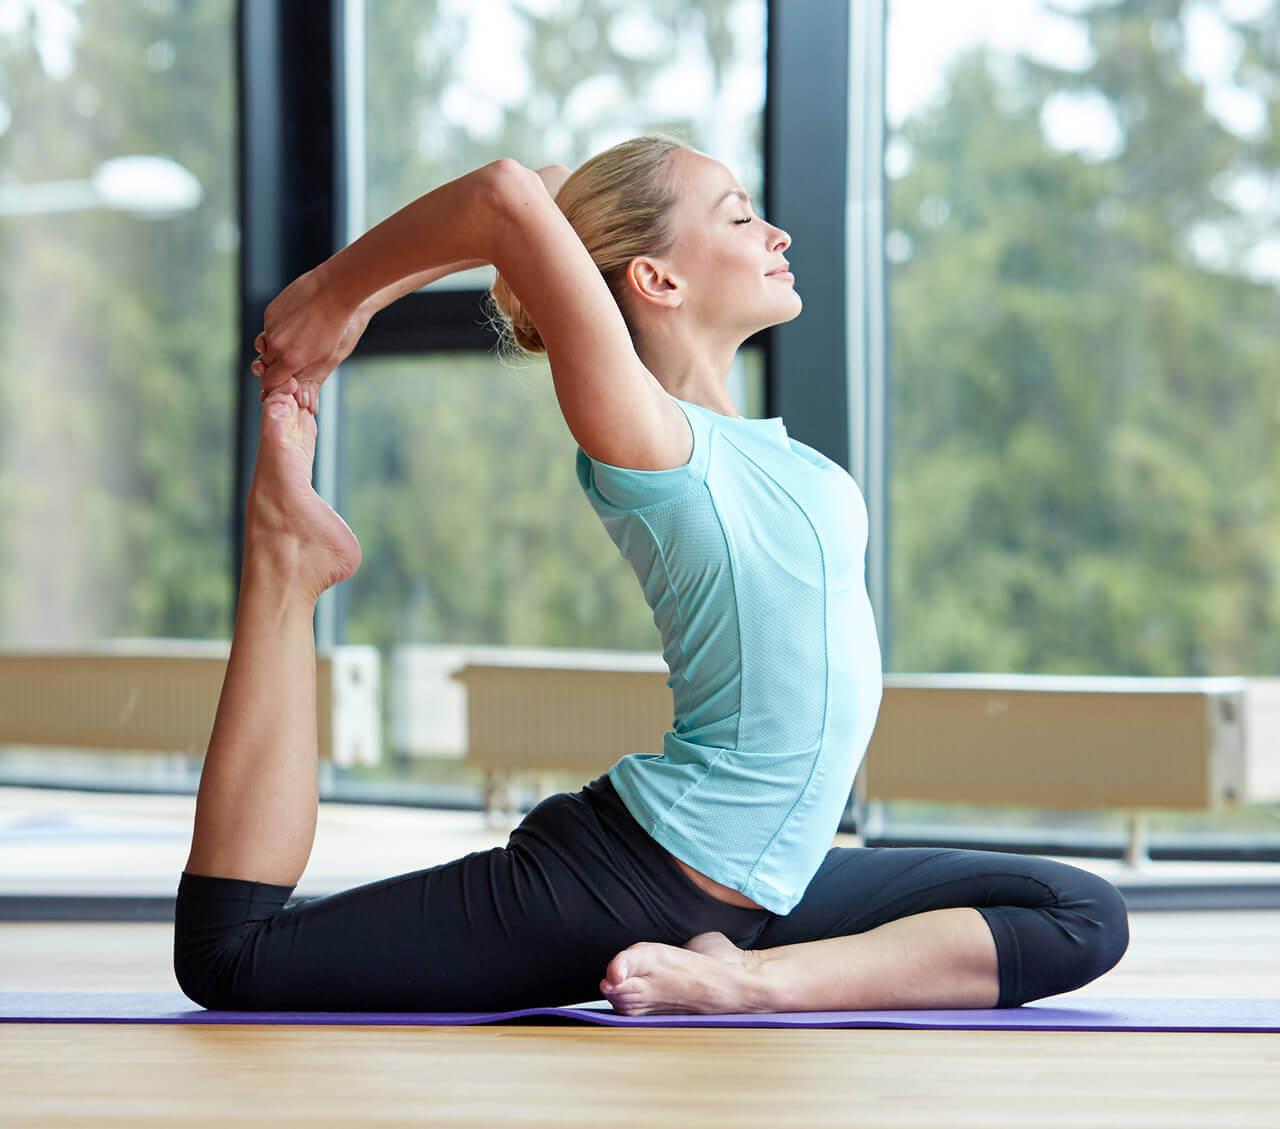 Flexibility Training by Las Vegas Personal Trainer